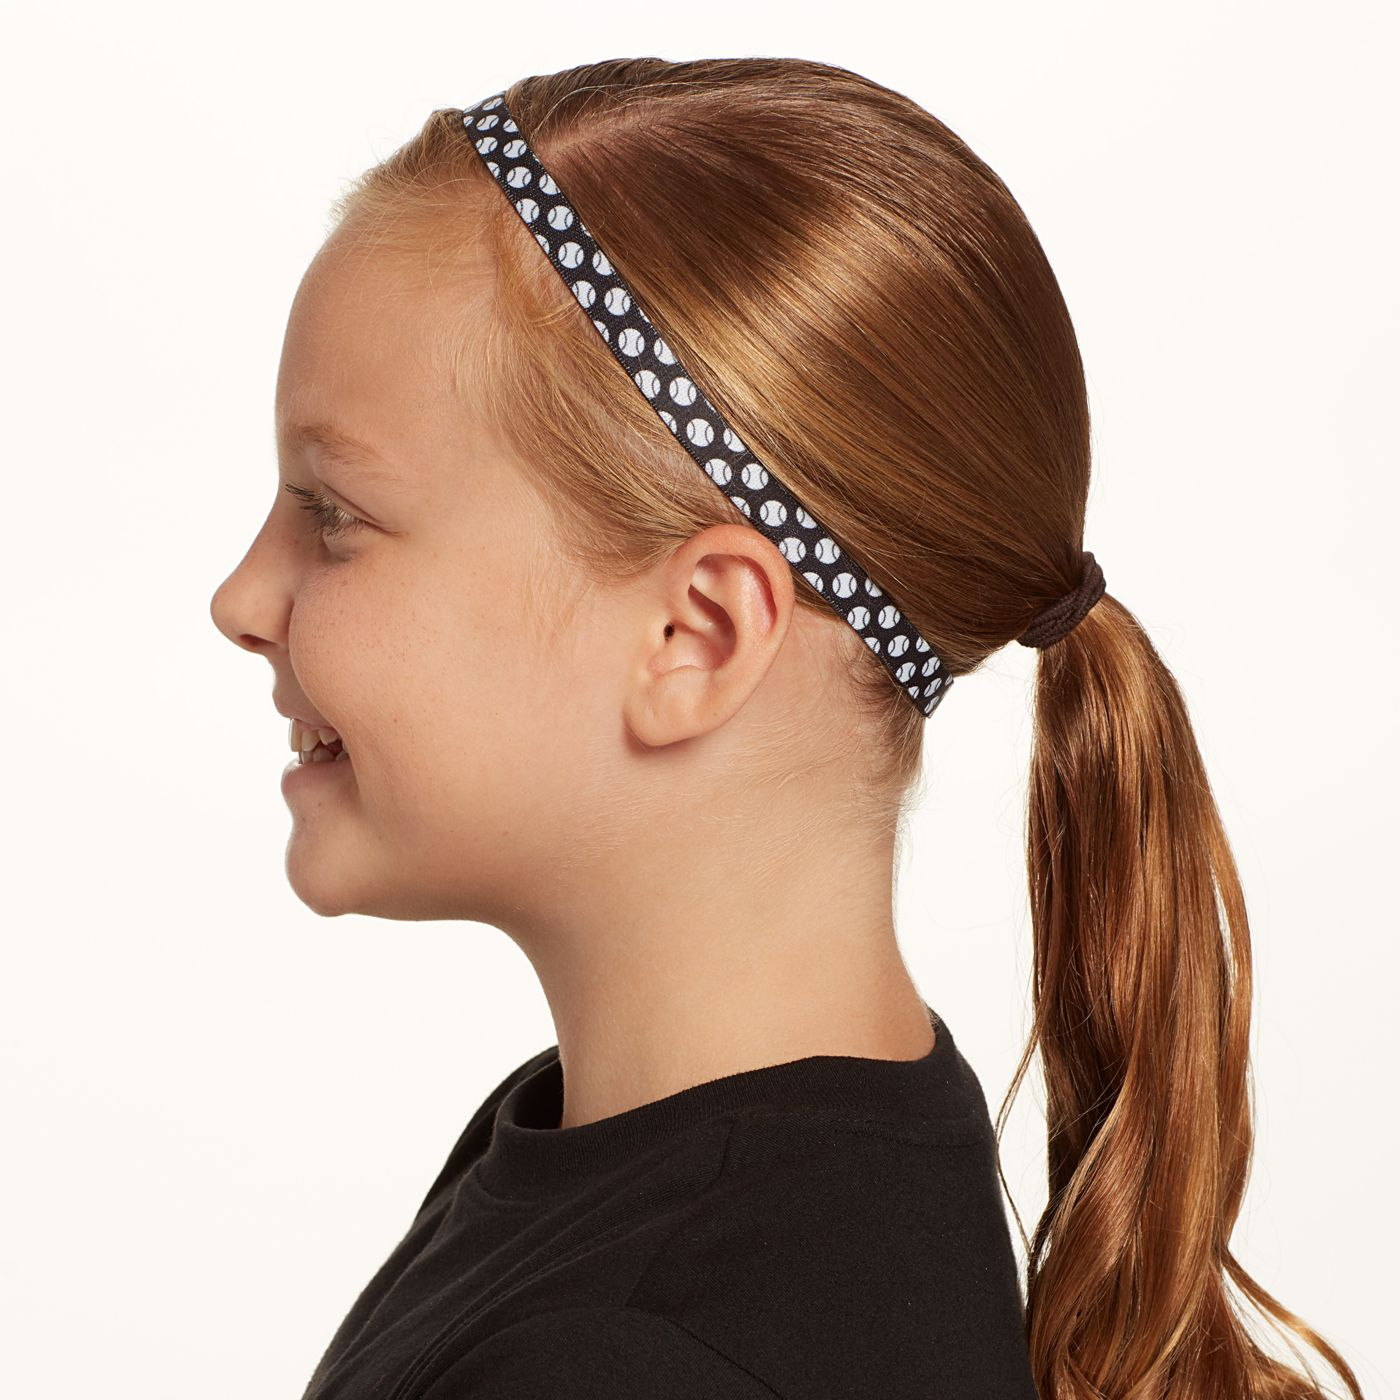 Dicks Sporting Goods Softball Headbands - 6 Pack  Dicks -9525